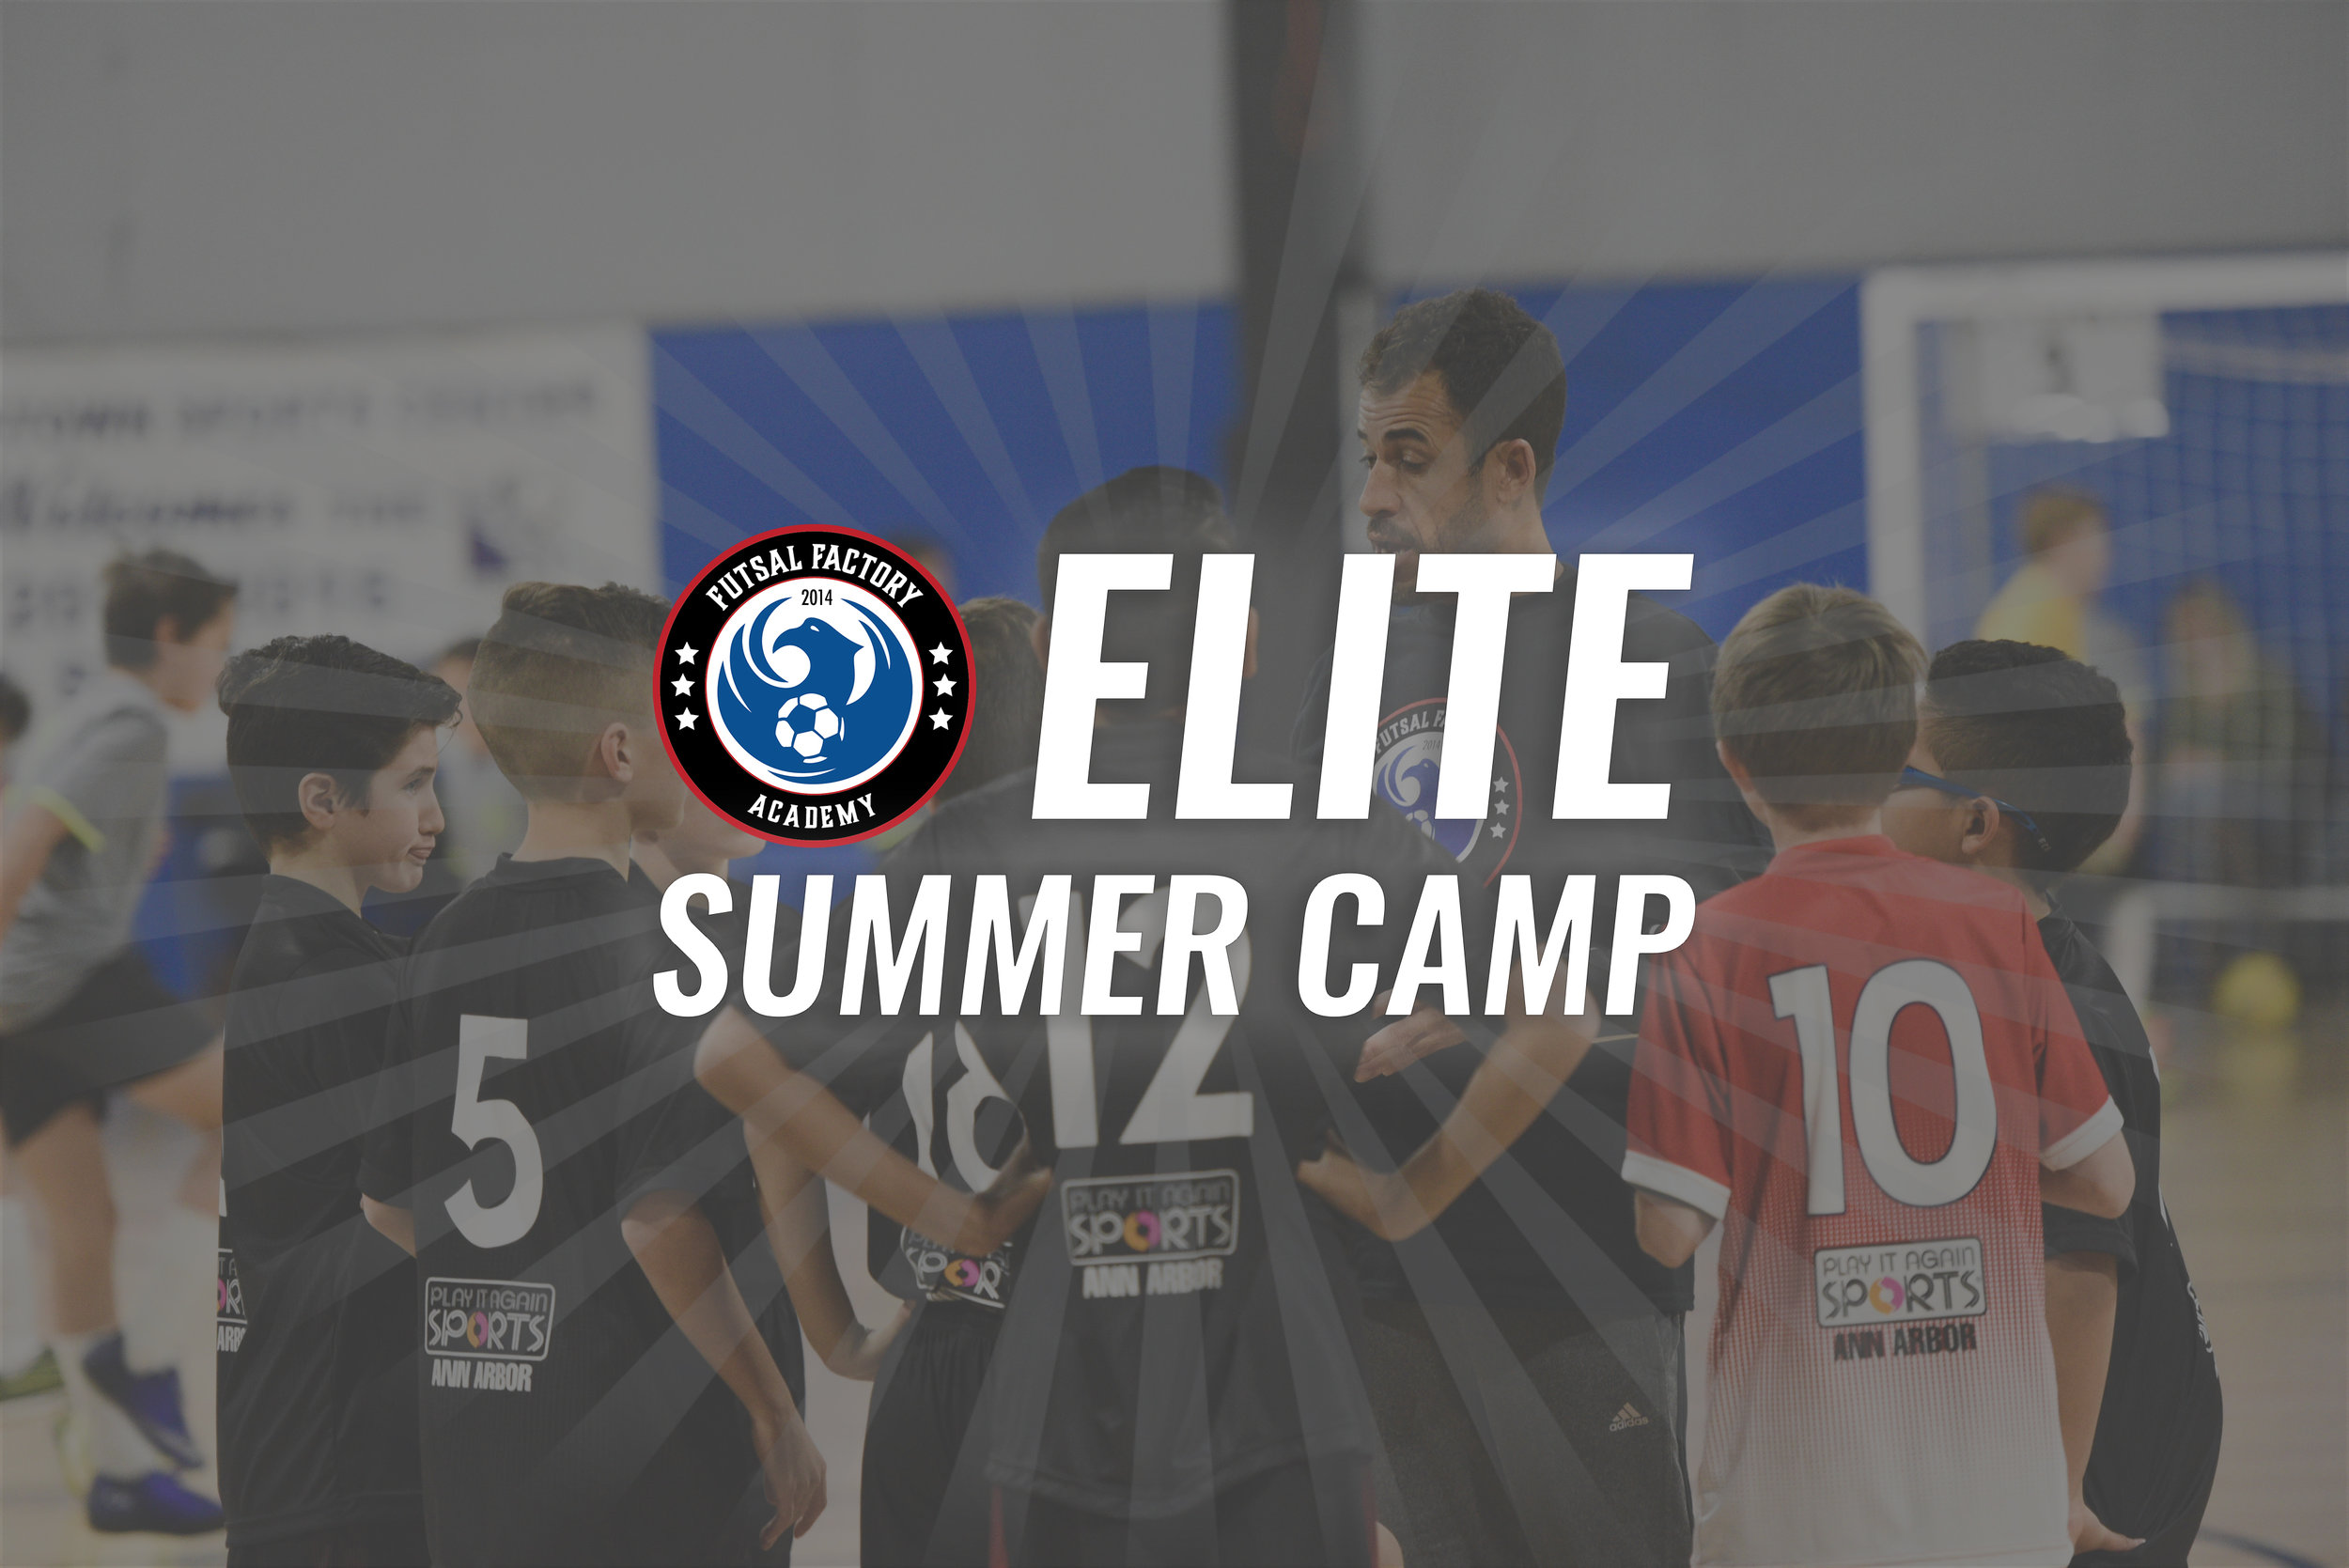 Elite Summer Camp.jpg